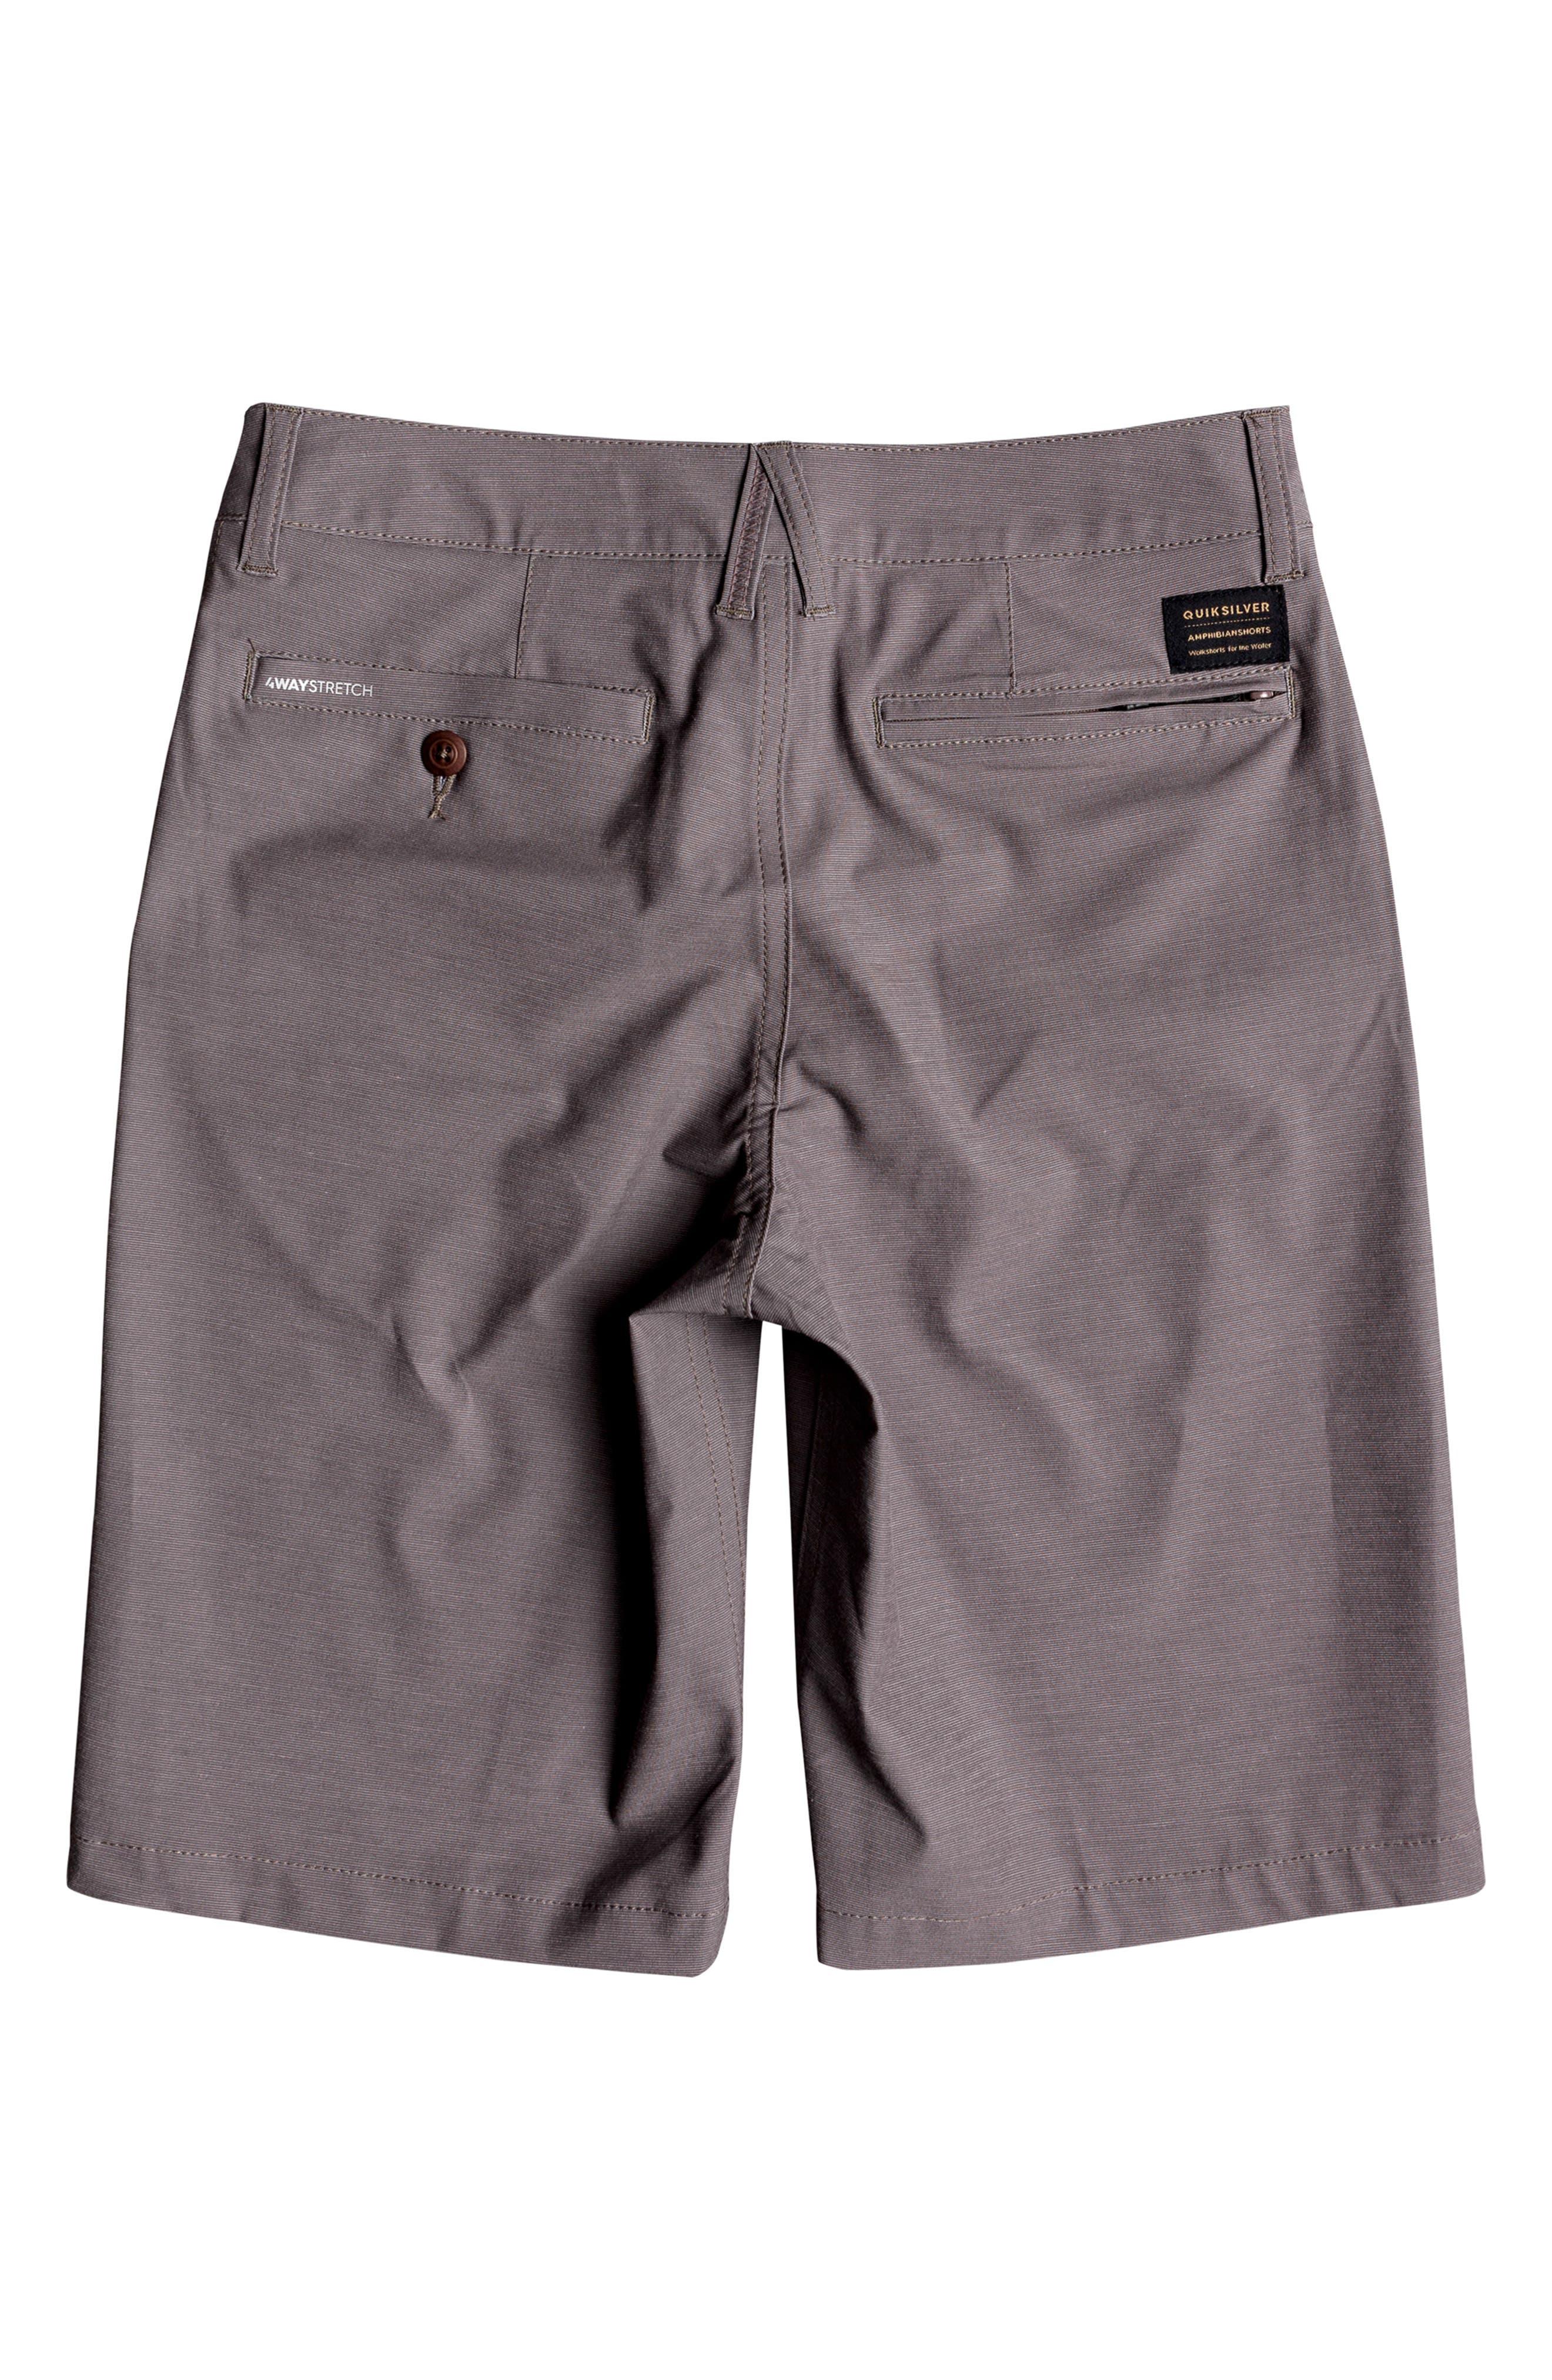 3557975e3a union shorts | Nordstrom